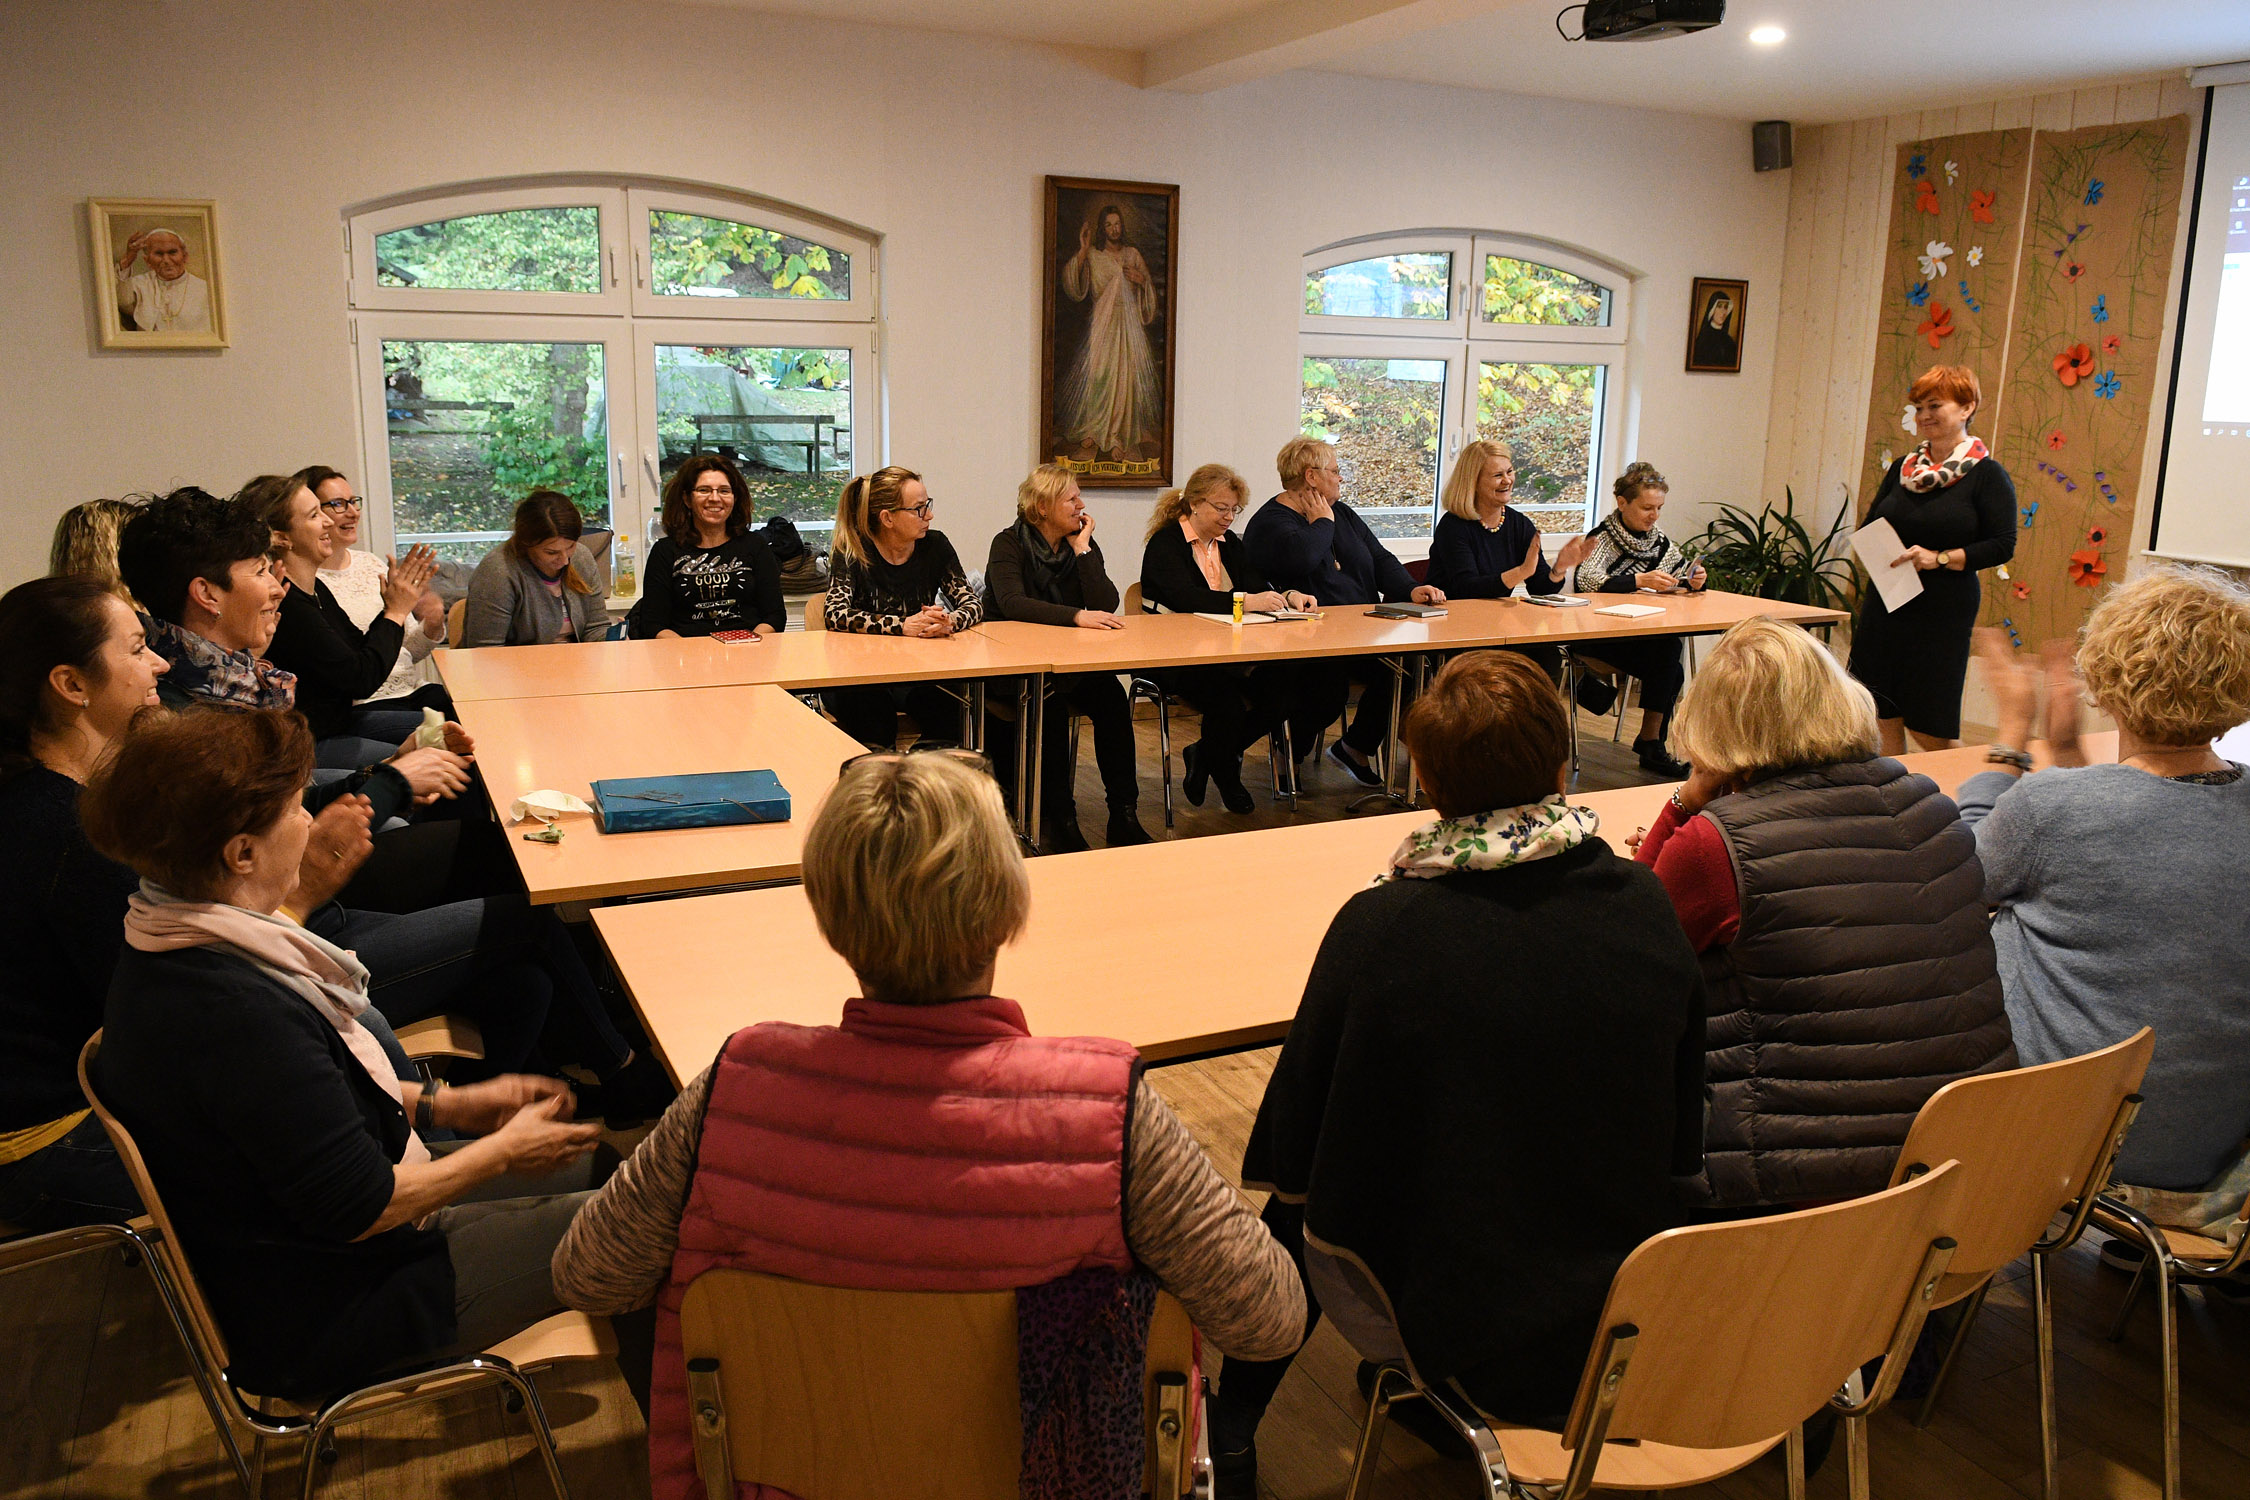 Haus Concordia   Herdorf - Dermbach   2018.10.27  Foto: Thomas Wagner   www.meinphotograph.eu  kontakt@meinphotograph.eu   © 2018 Thomas Wagner  Alle Rechte vorbehalten.